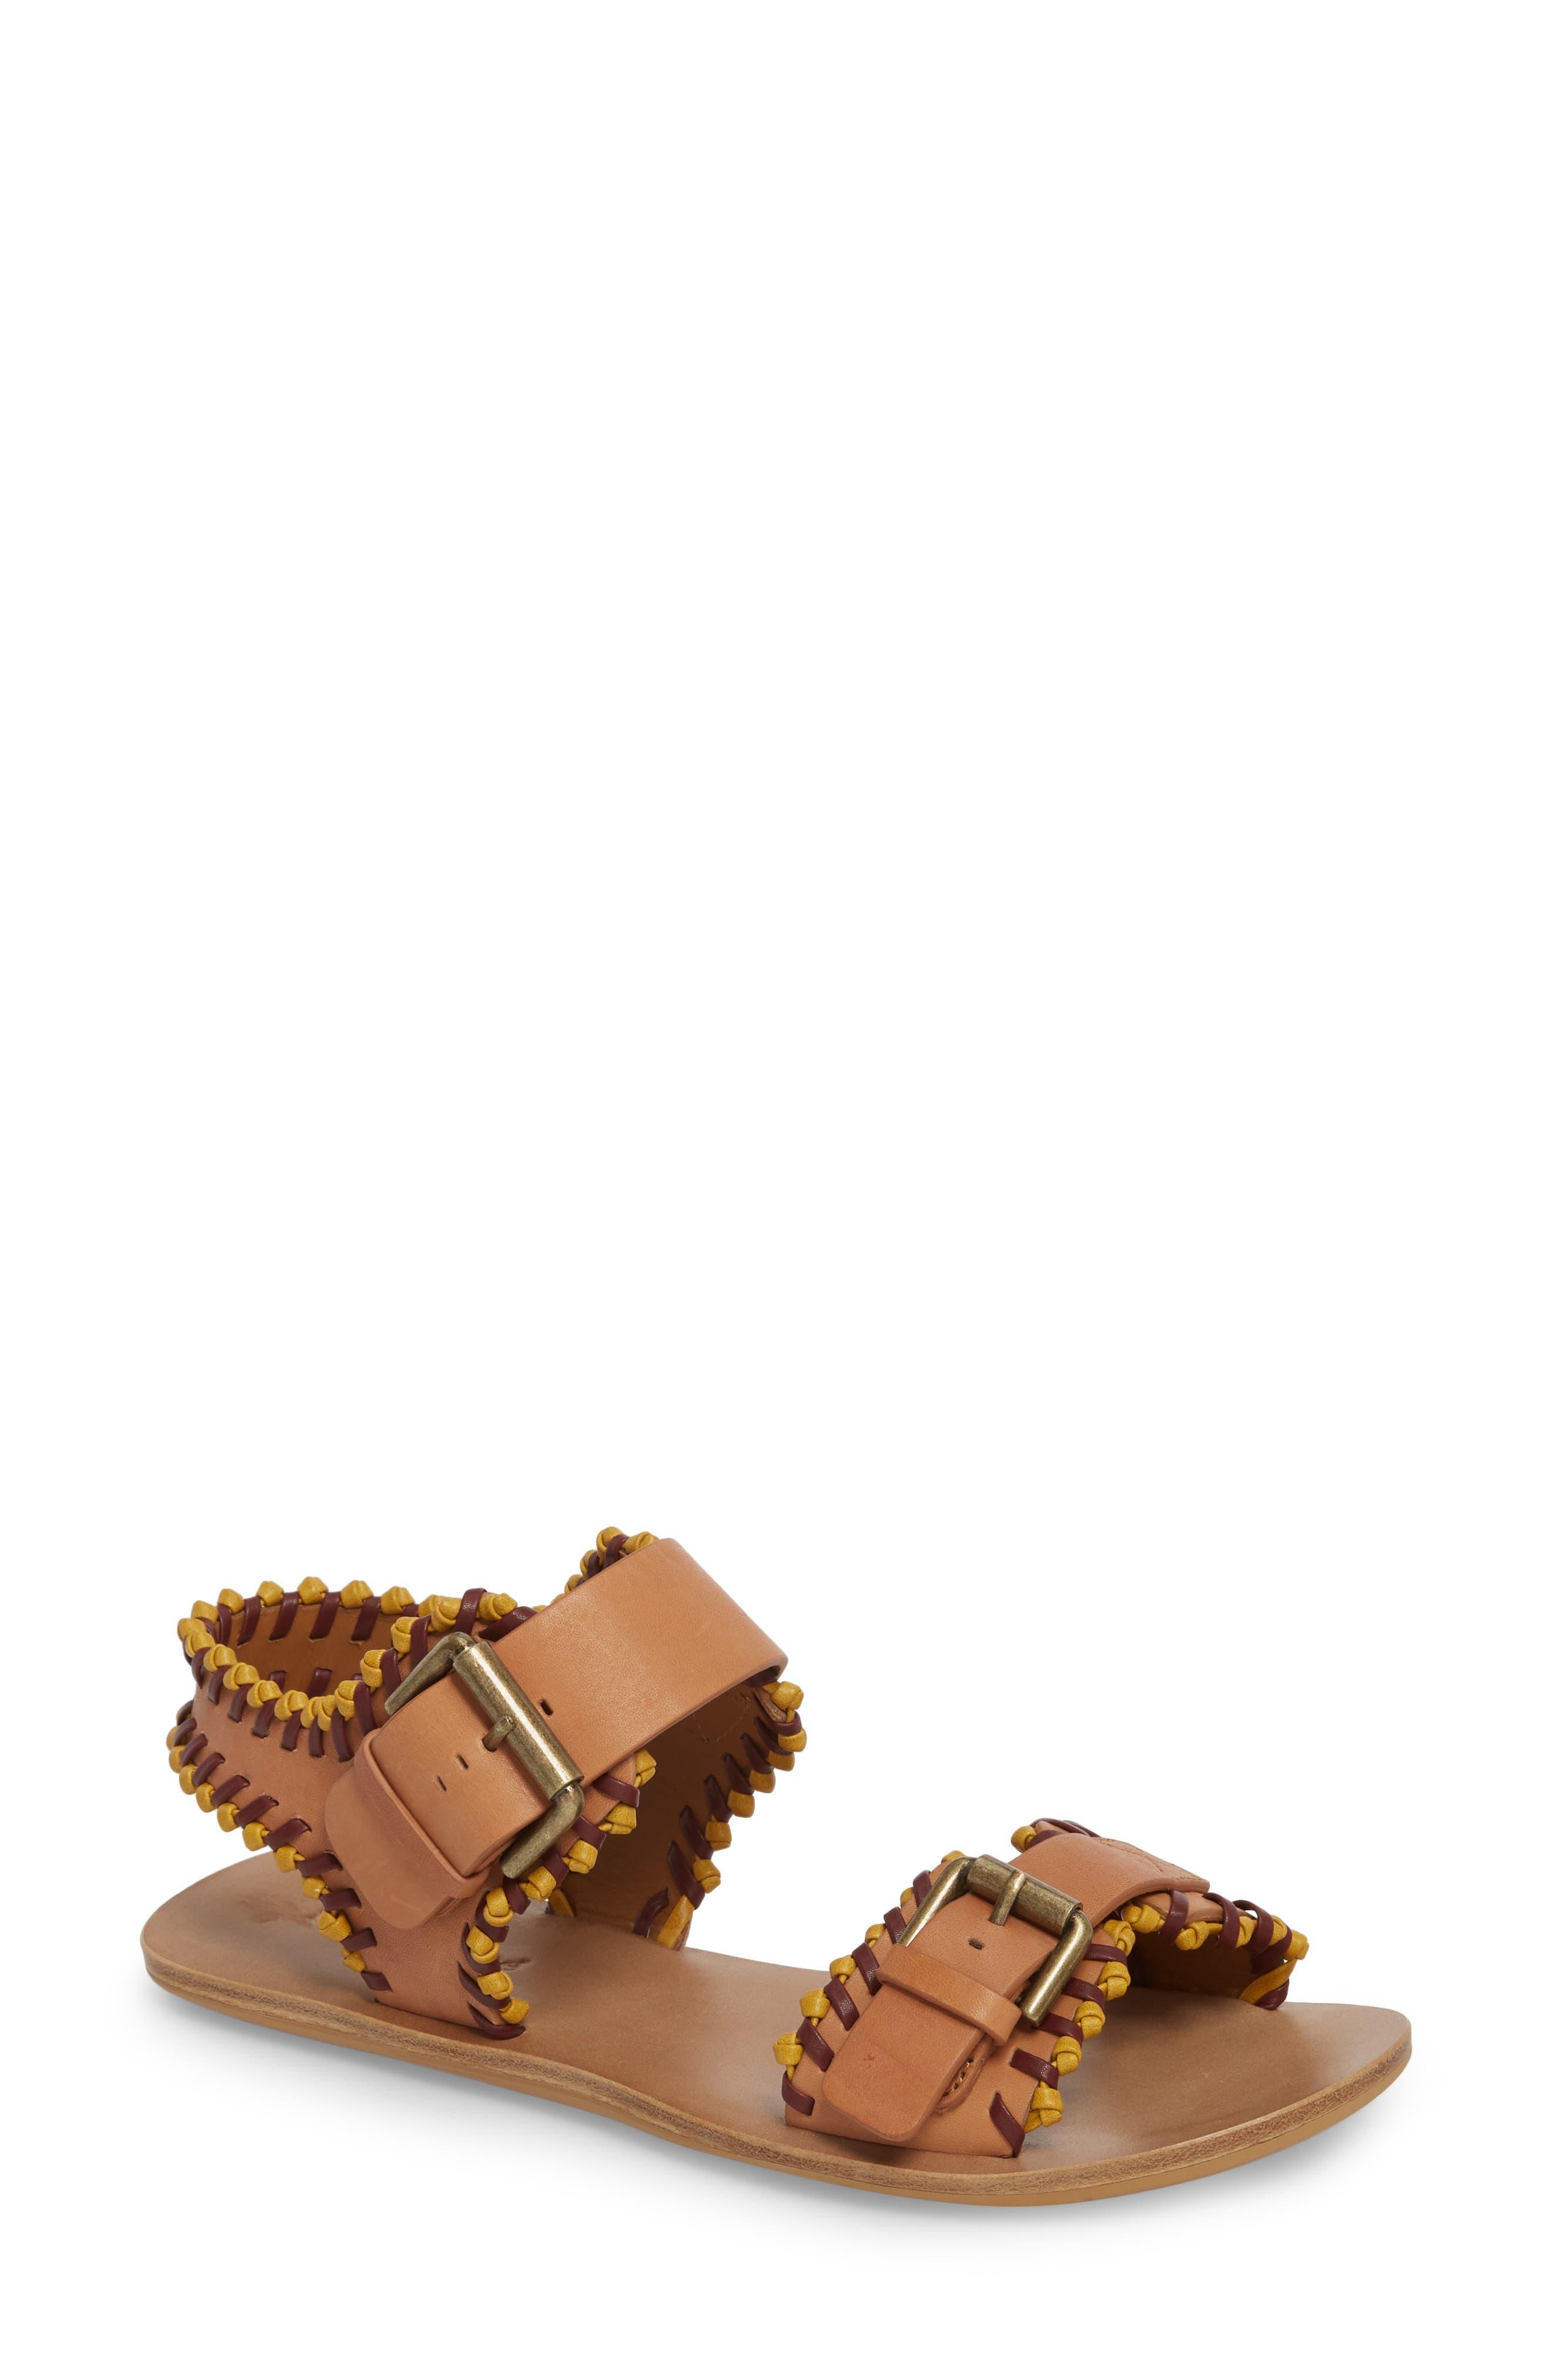 Romy Flat Sandal,                         Main,                         color, 230